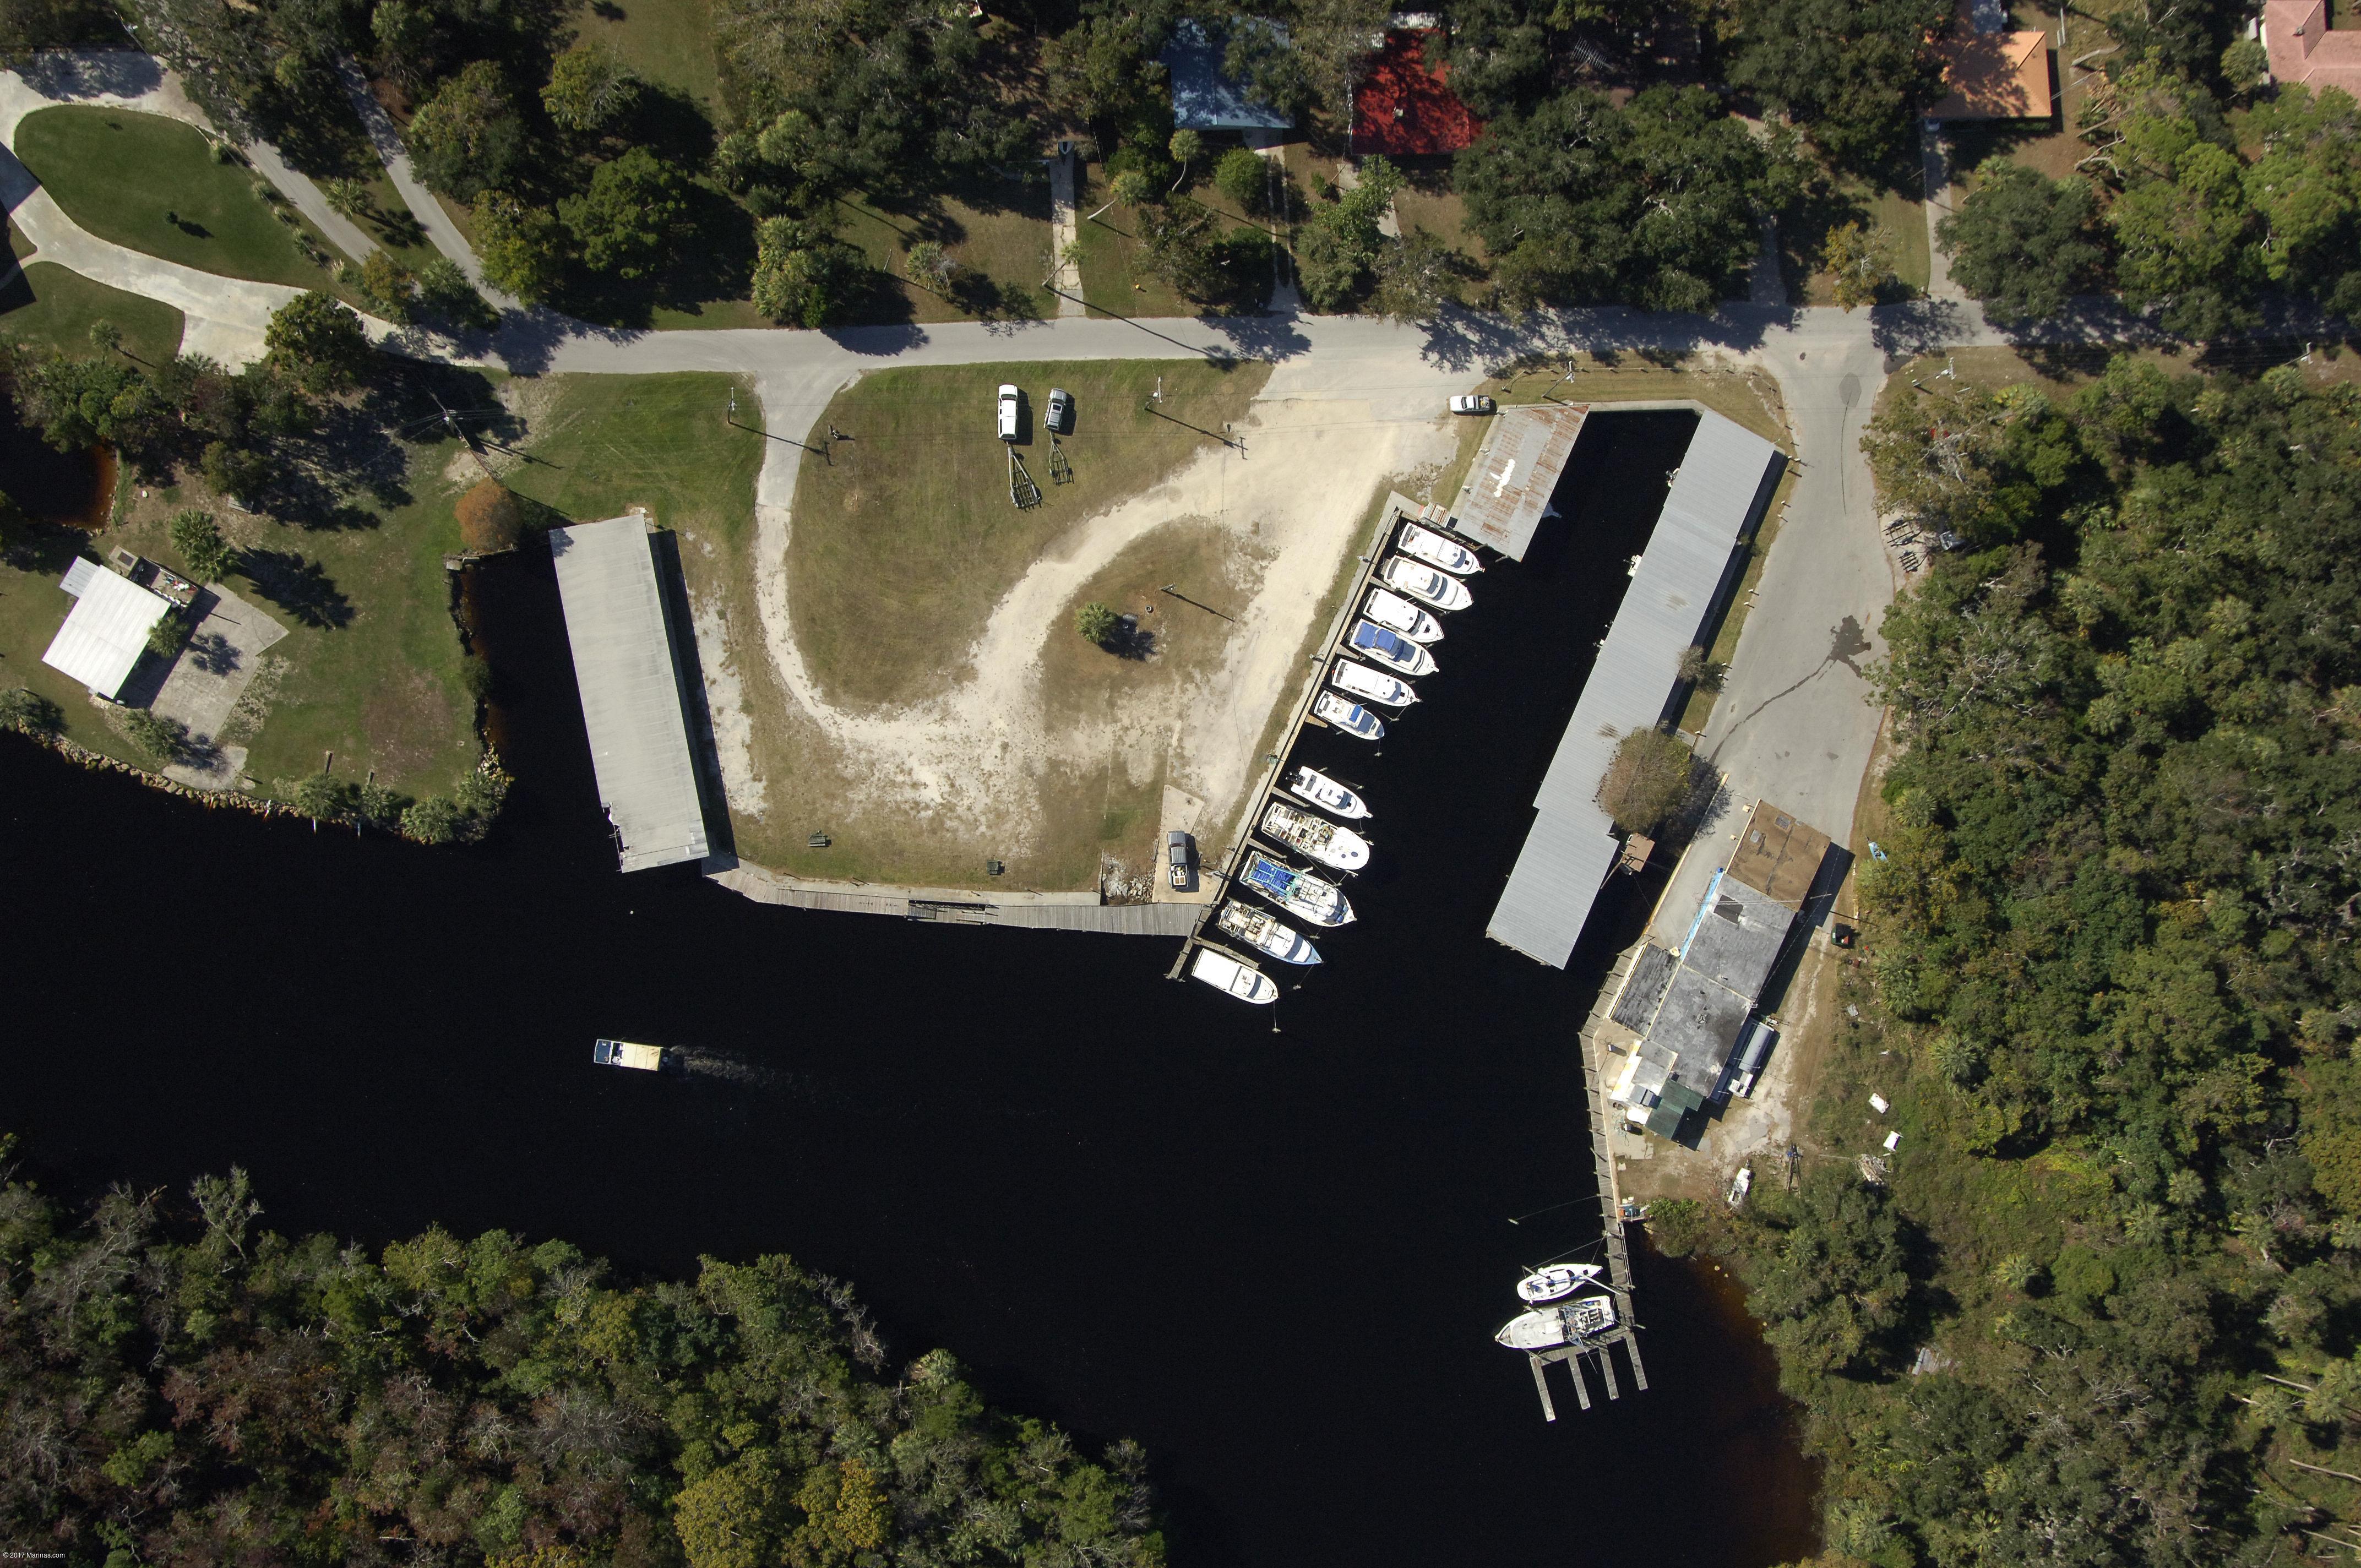 Yankeetown Marina In Yankeetown FL United States Marina - Yankeetown florida map